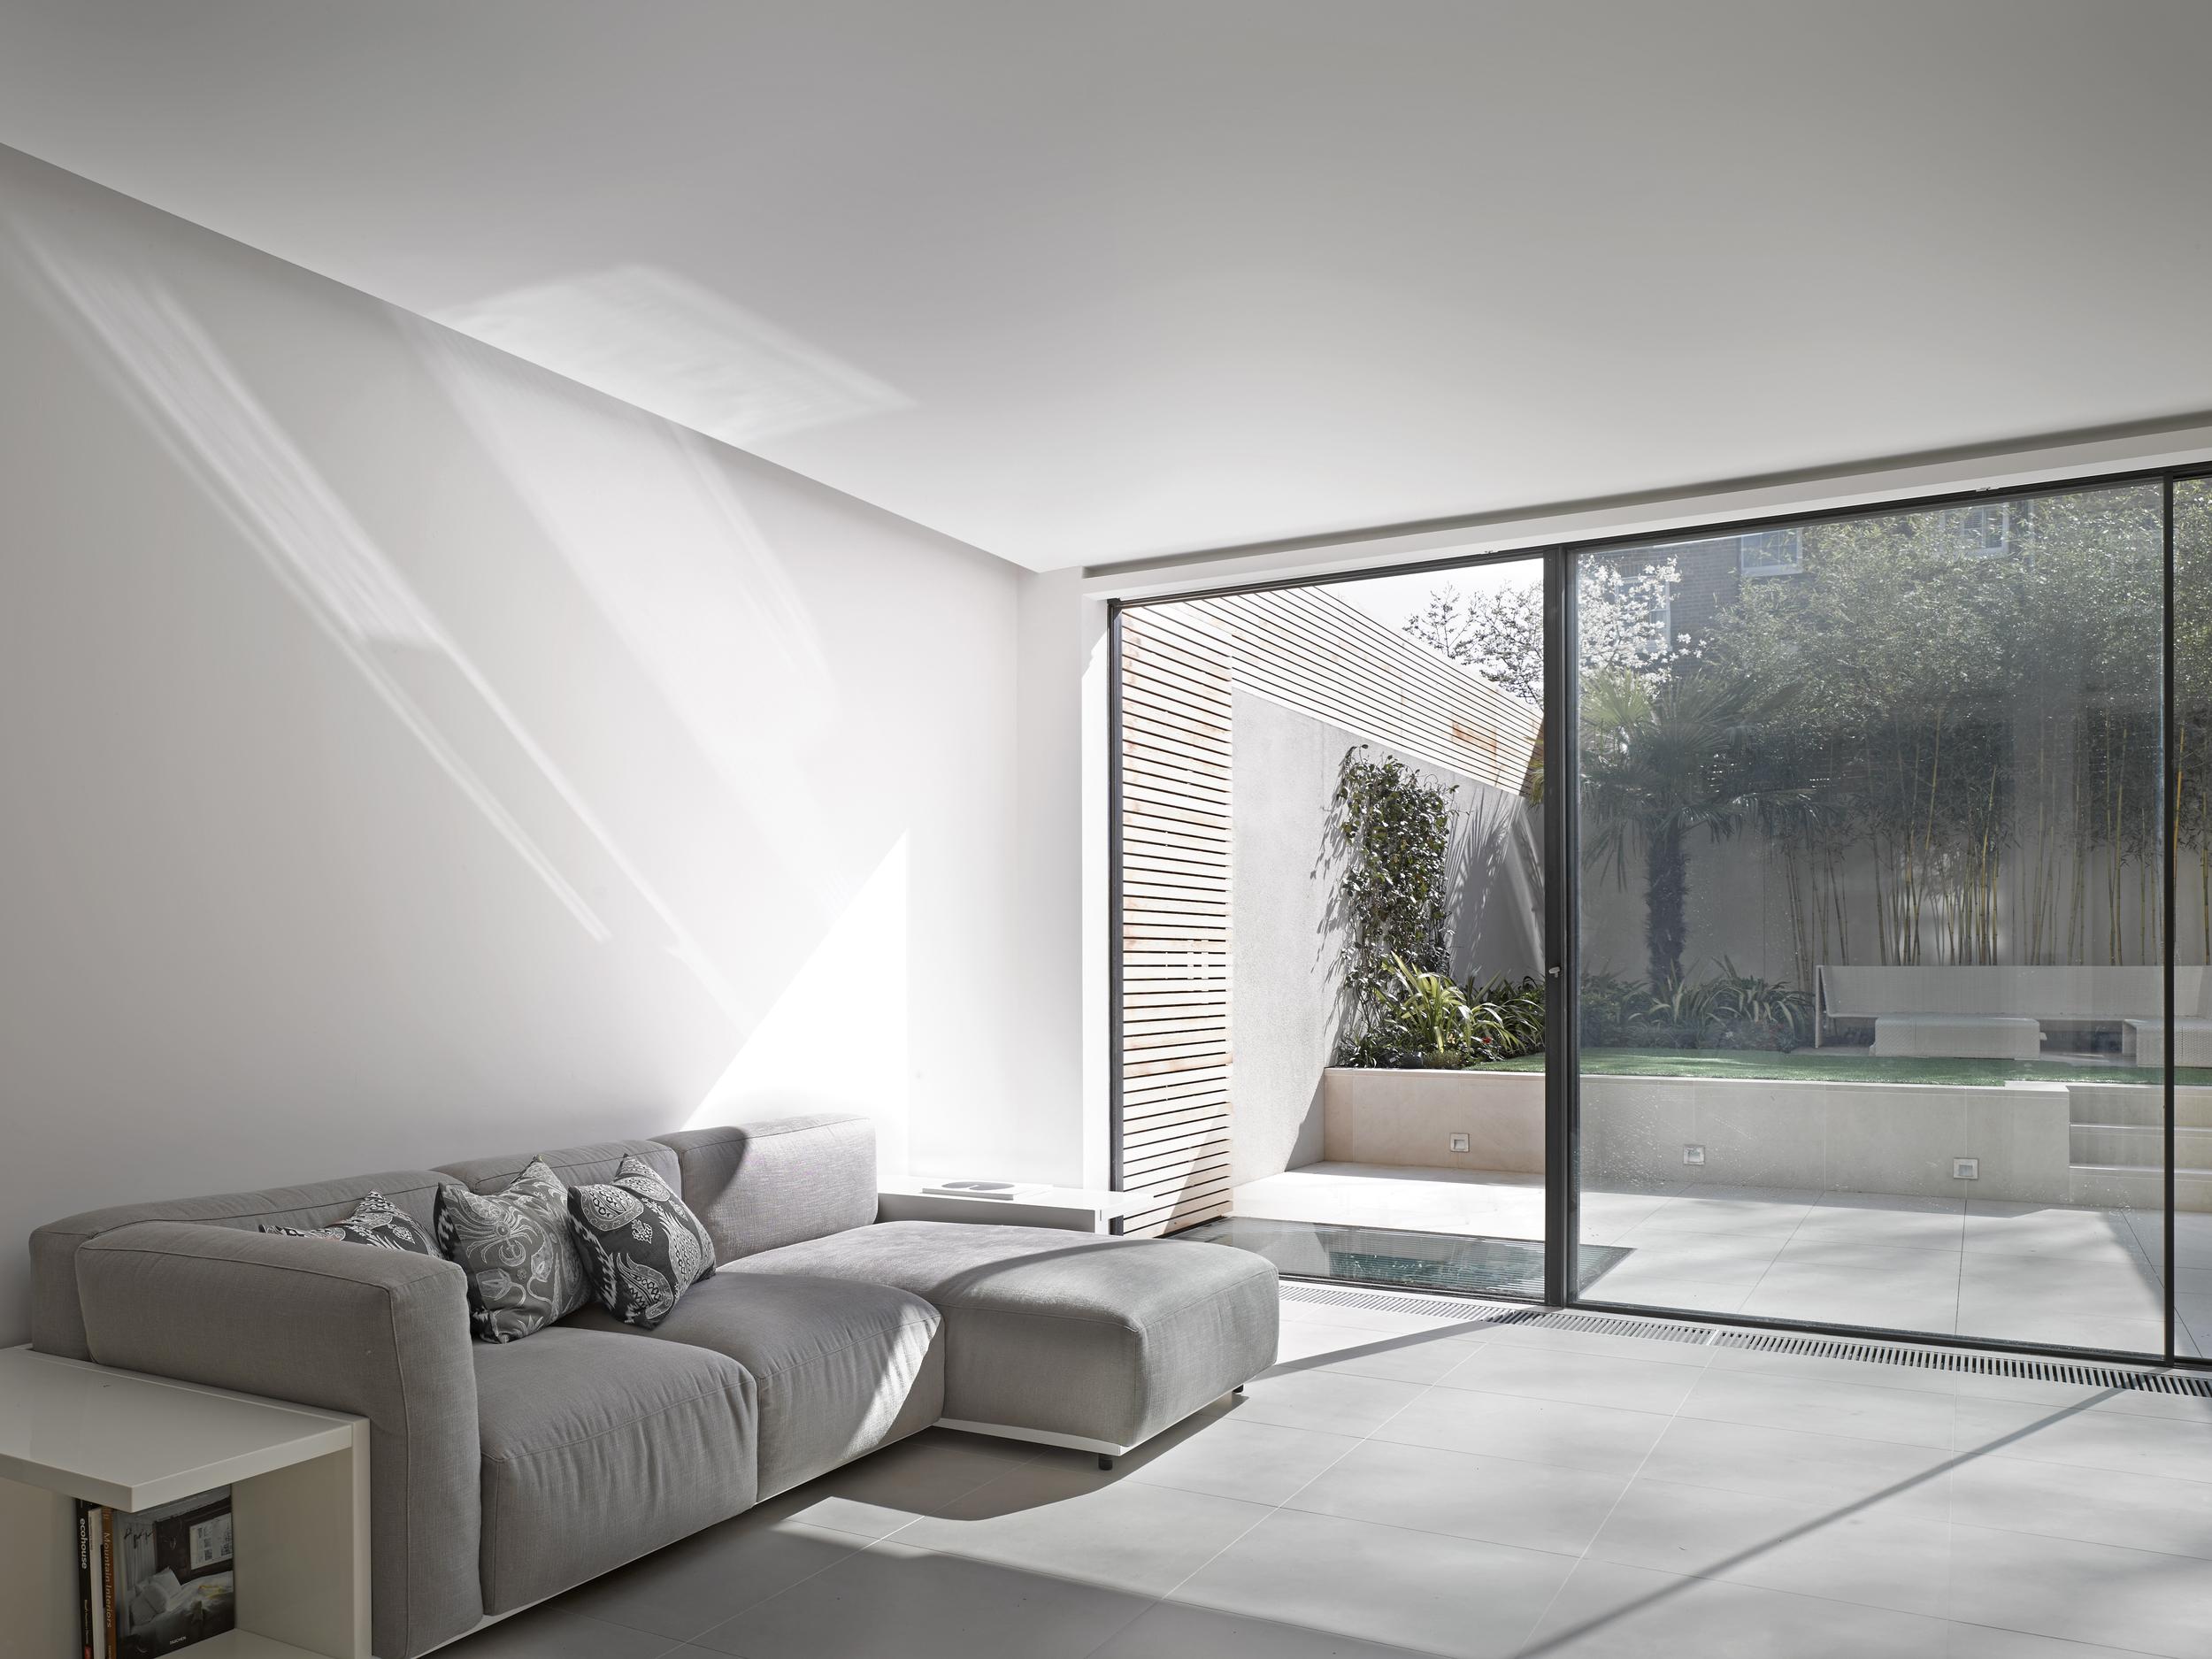 NGUT-1280-JL Architects-0012R.jpg